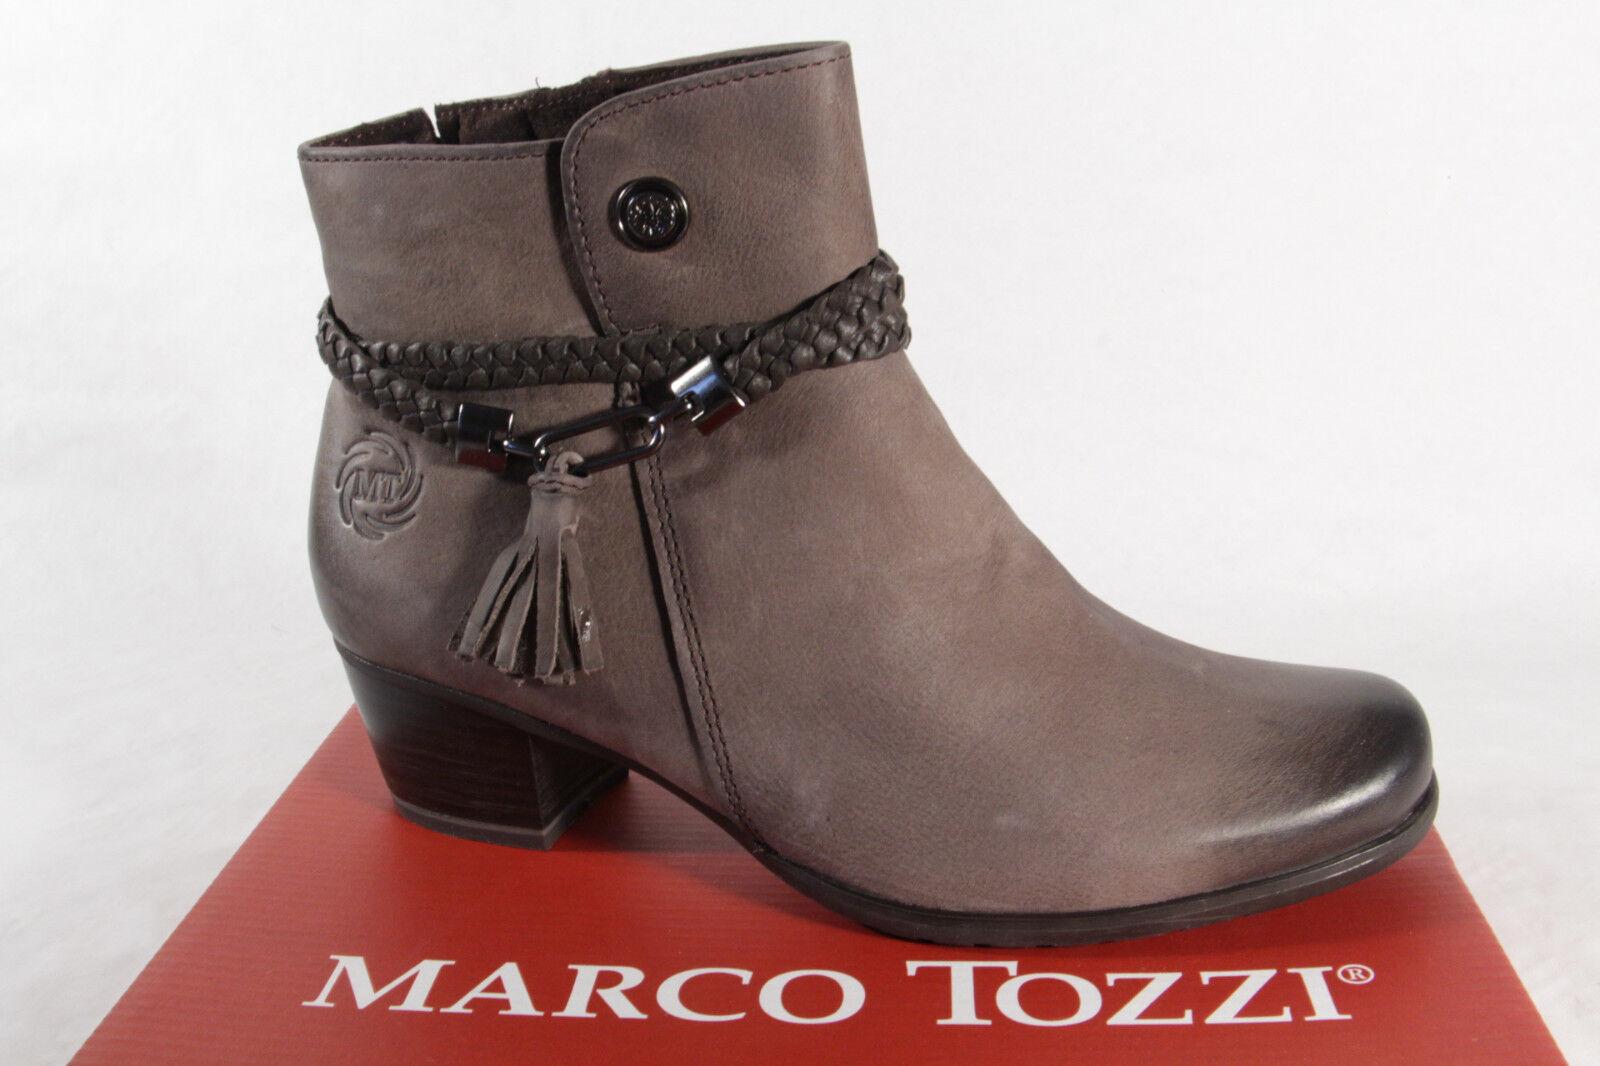 Marco Tozzi Tozzi Tozzi 25383 botas Mujer, Botines, botas Cuero Auténtico gris Nuevo  precios razonables